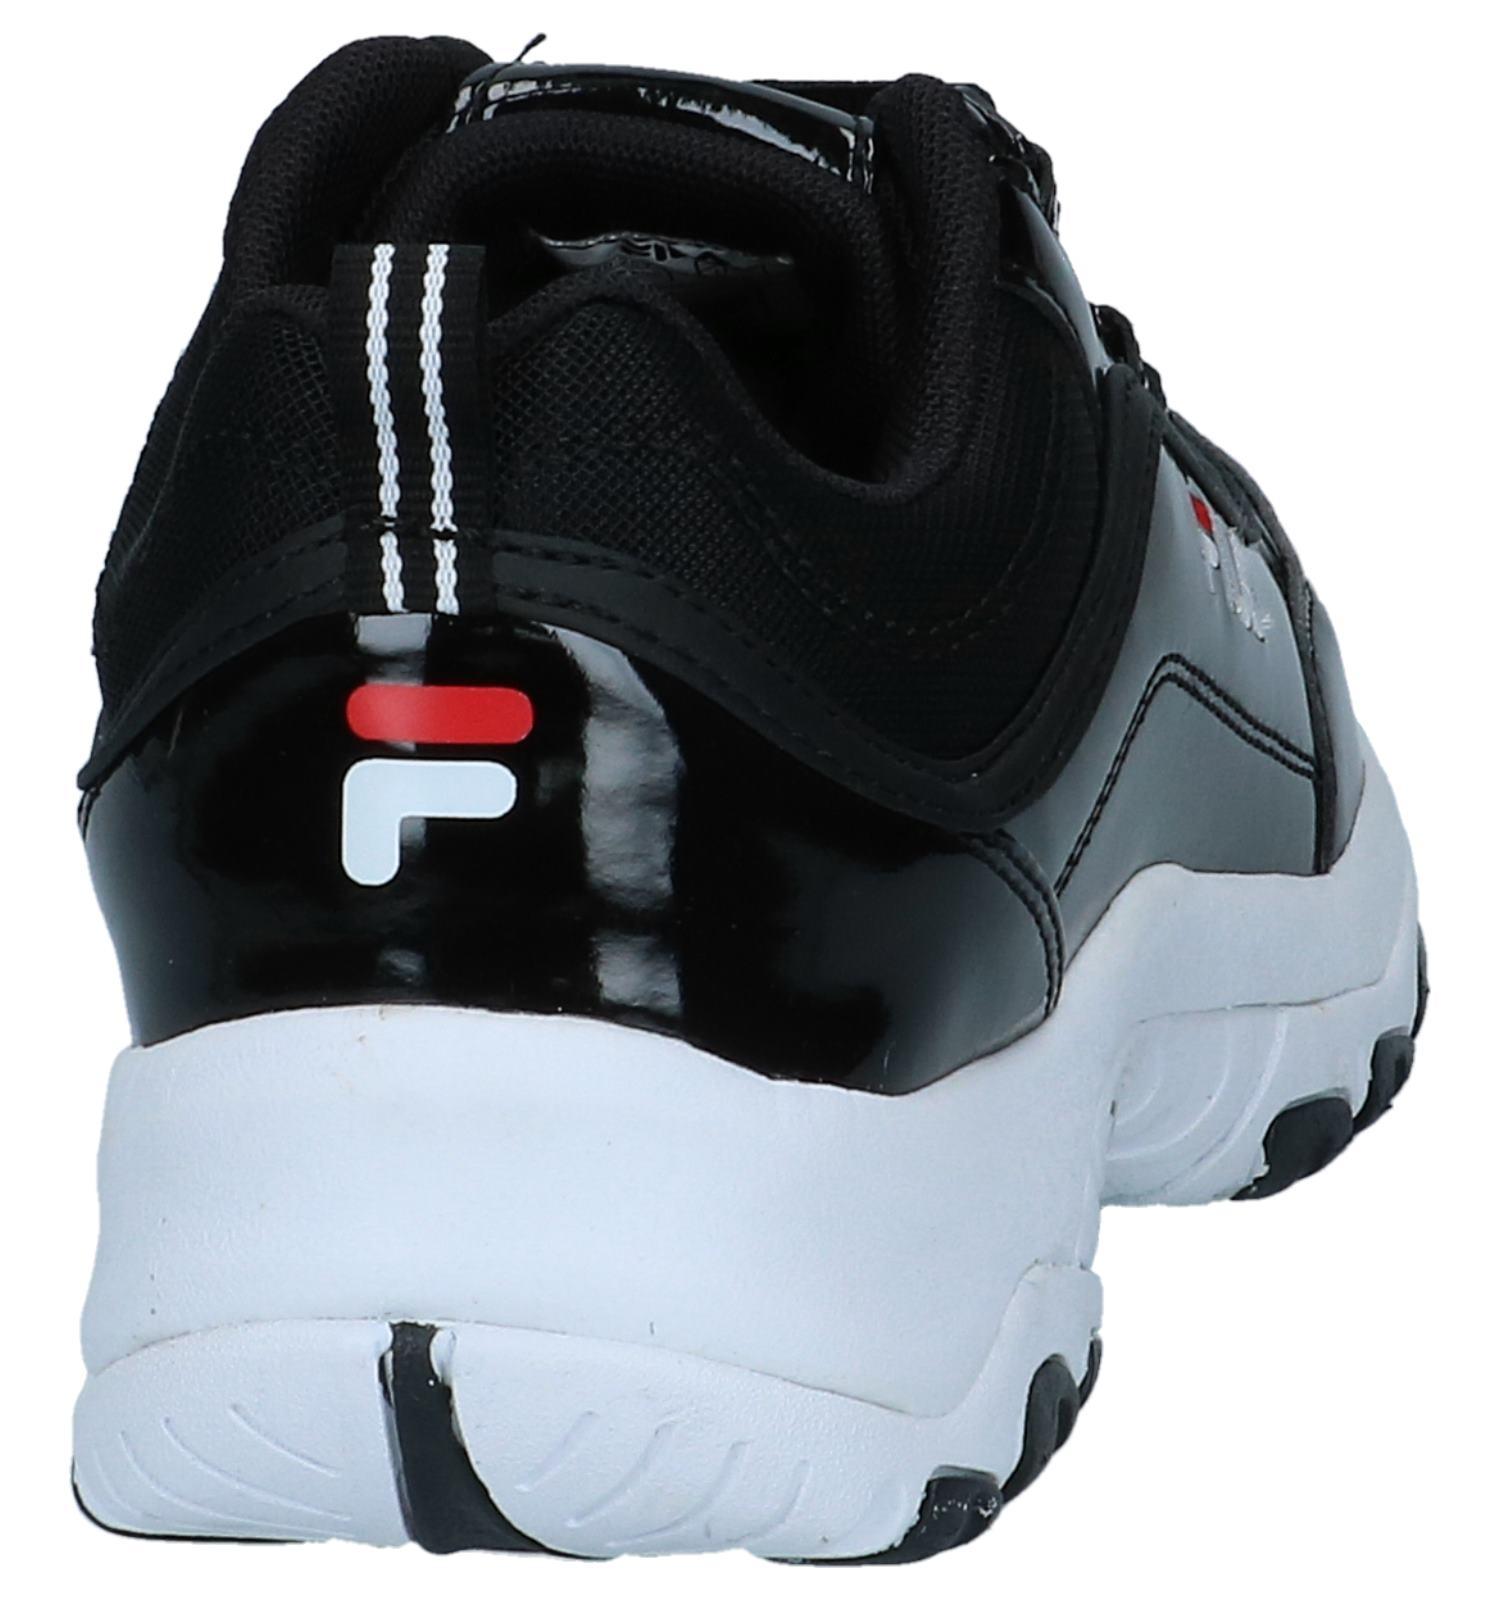 9e28f8bb6fc Zwarte Lage Sneakers Fila Strada   TORFS.BE   Gratis verzend en retour